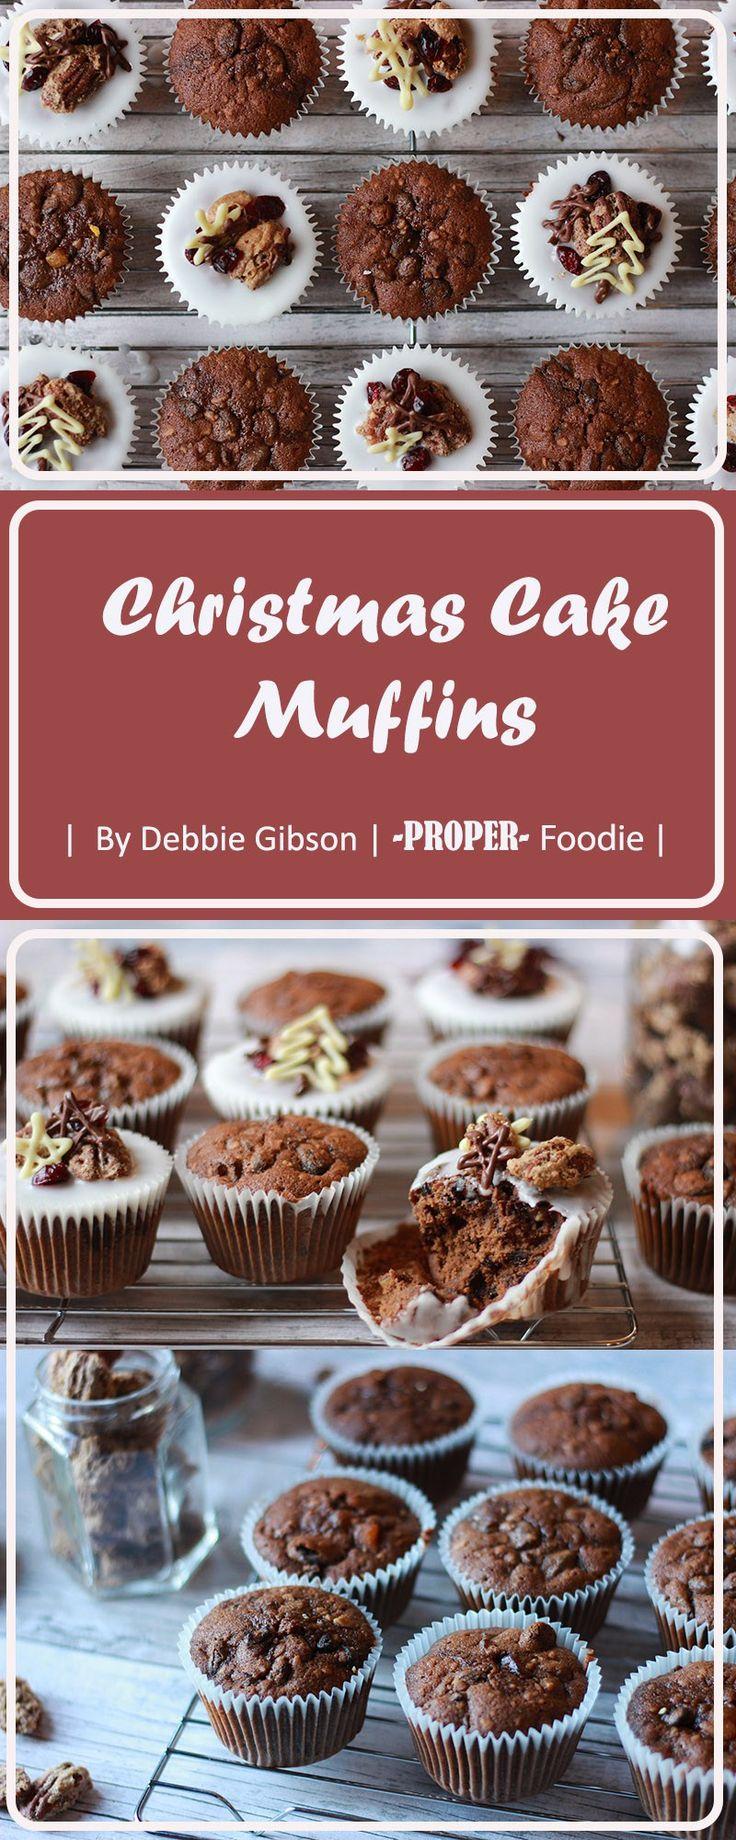 Christmas cake muffins recipe